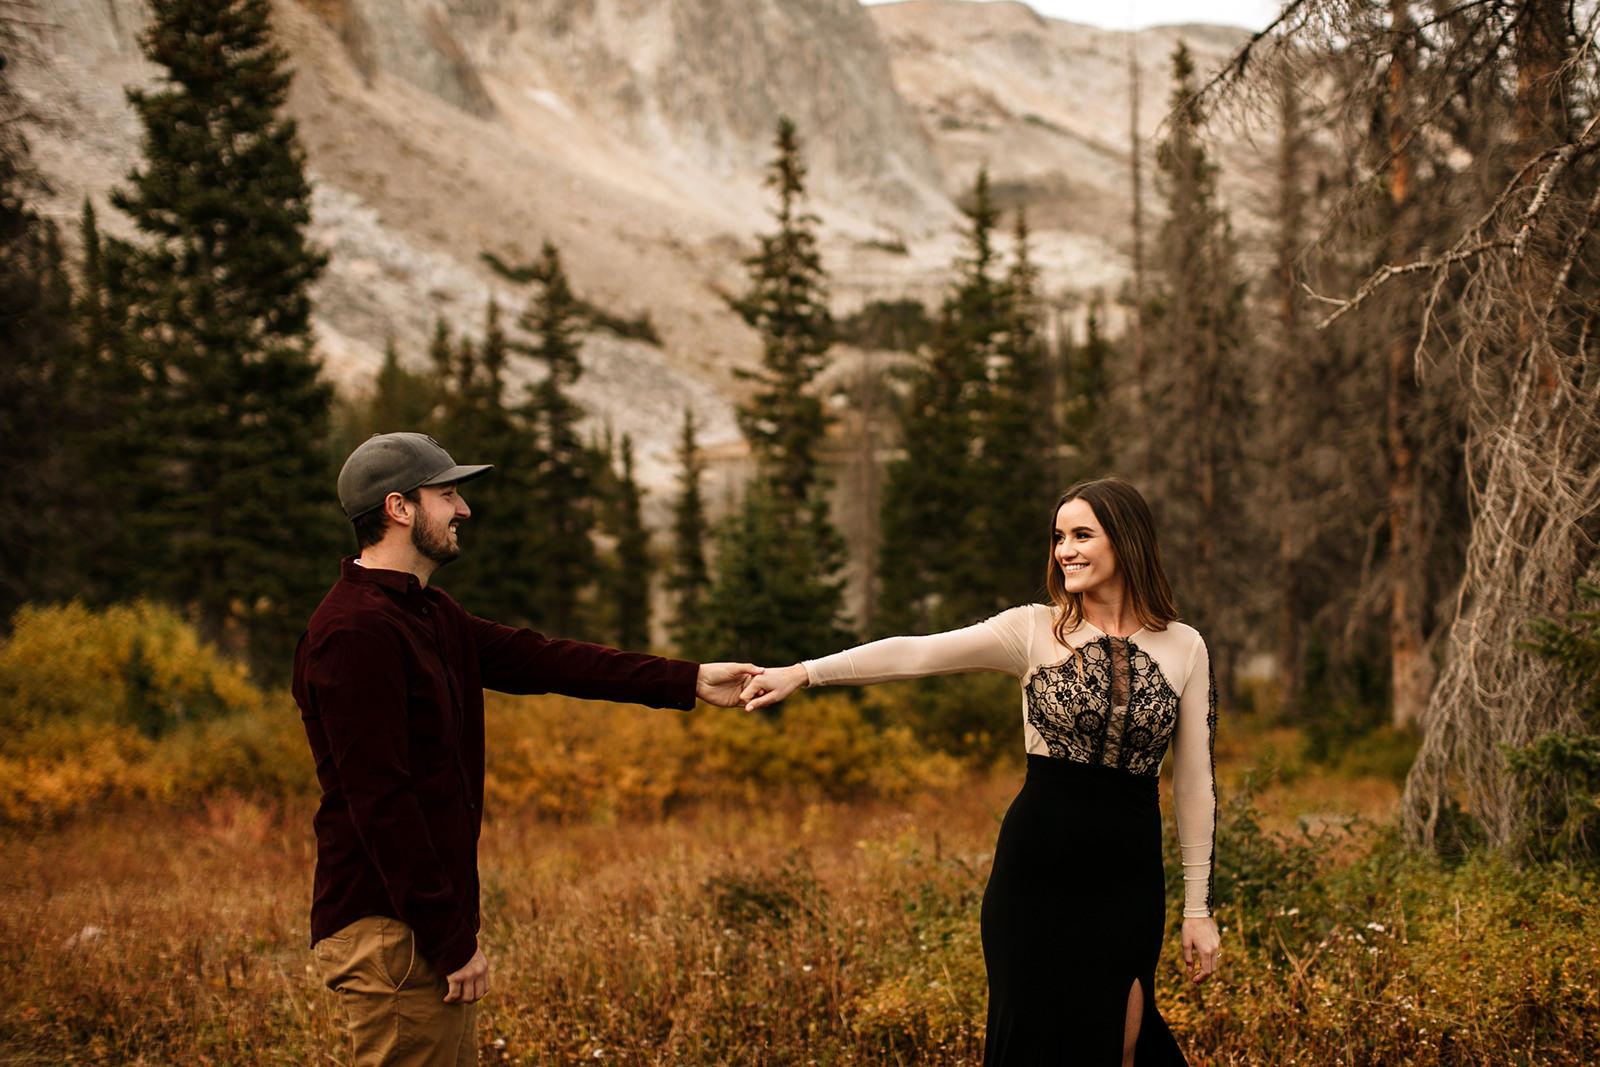 Liz Osban Photography Cheyenne Wyoming Engagement Wedding Photographer couple adventure elopement wedding laramie denver fort collins colorado rocky mountain national park26.jpg